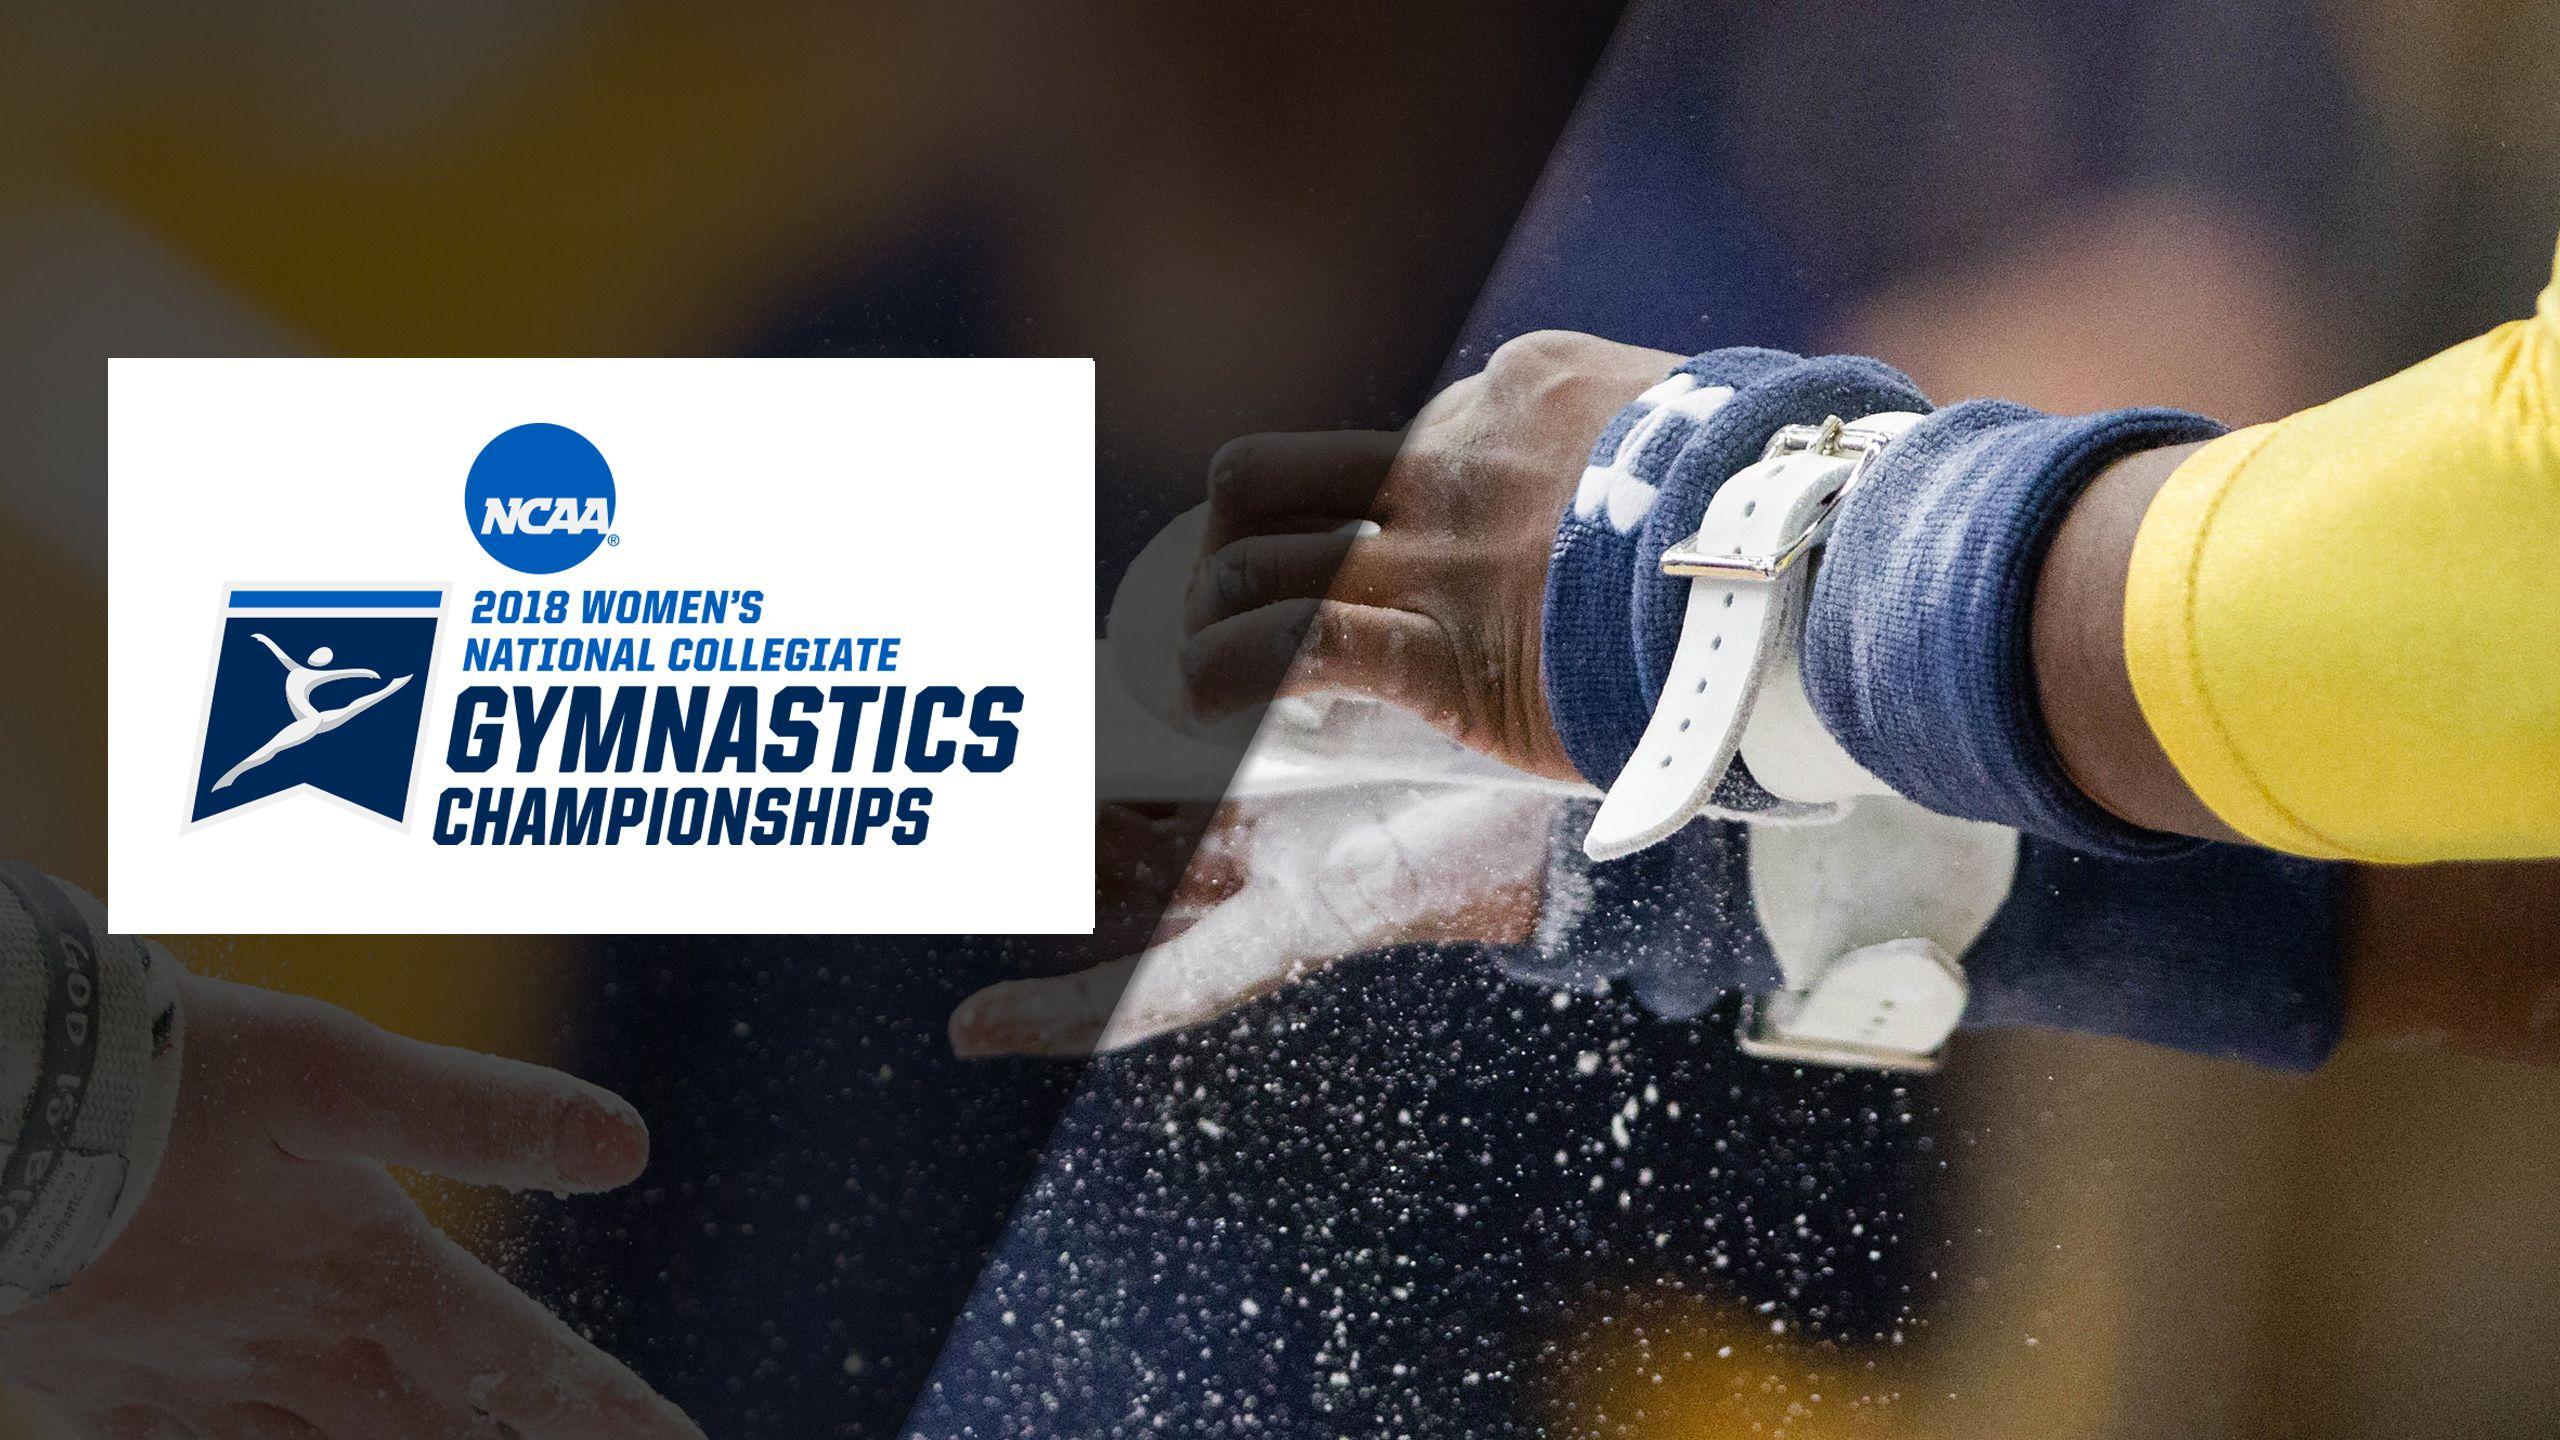 2018 NCAA Women's Gymnastics Championships (Championship)